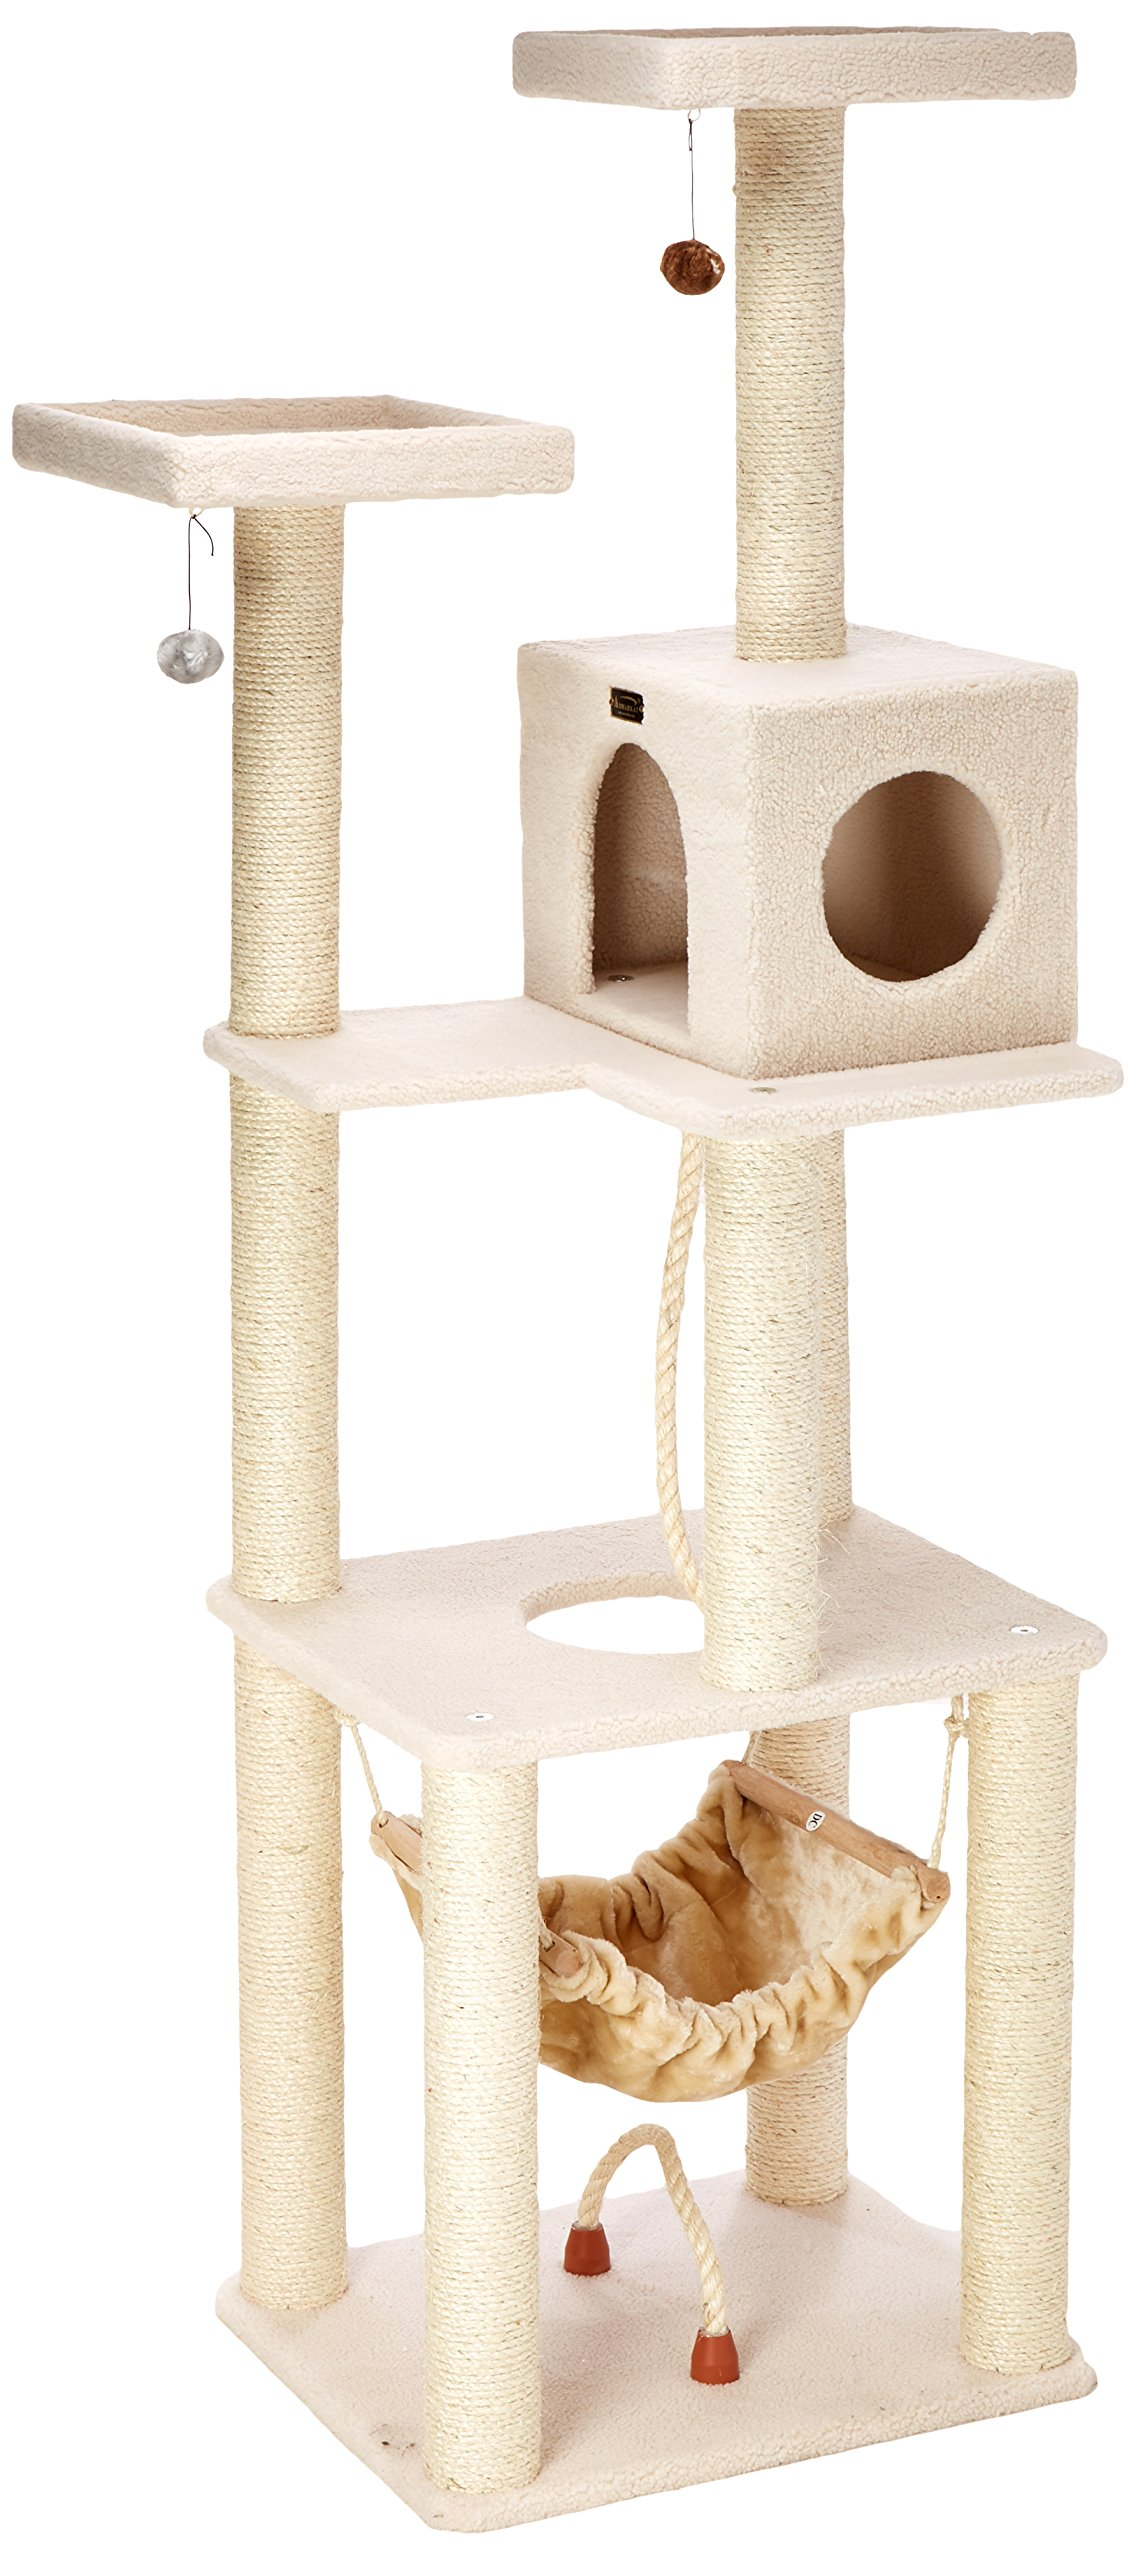 Armarkat Deluxe Cat Tree, Model B7301, Ivory